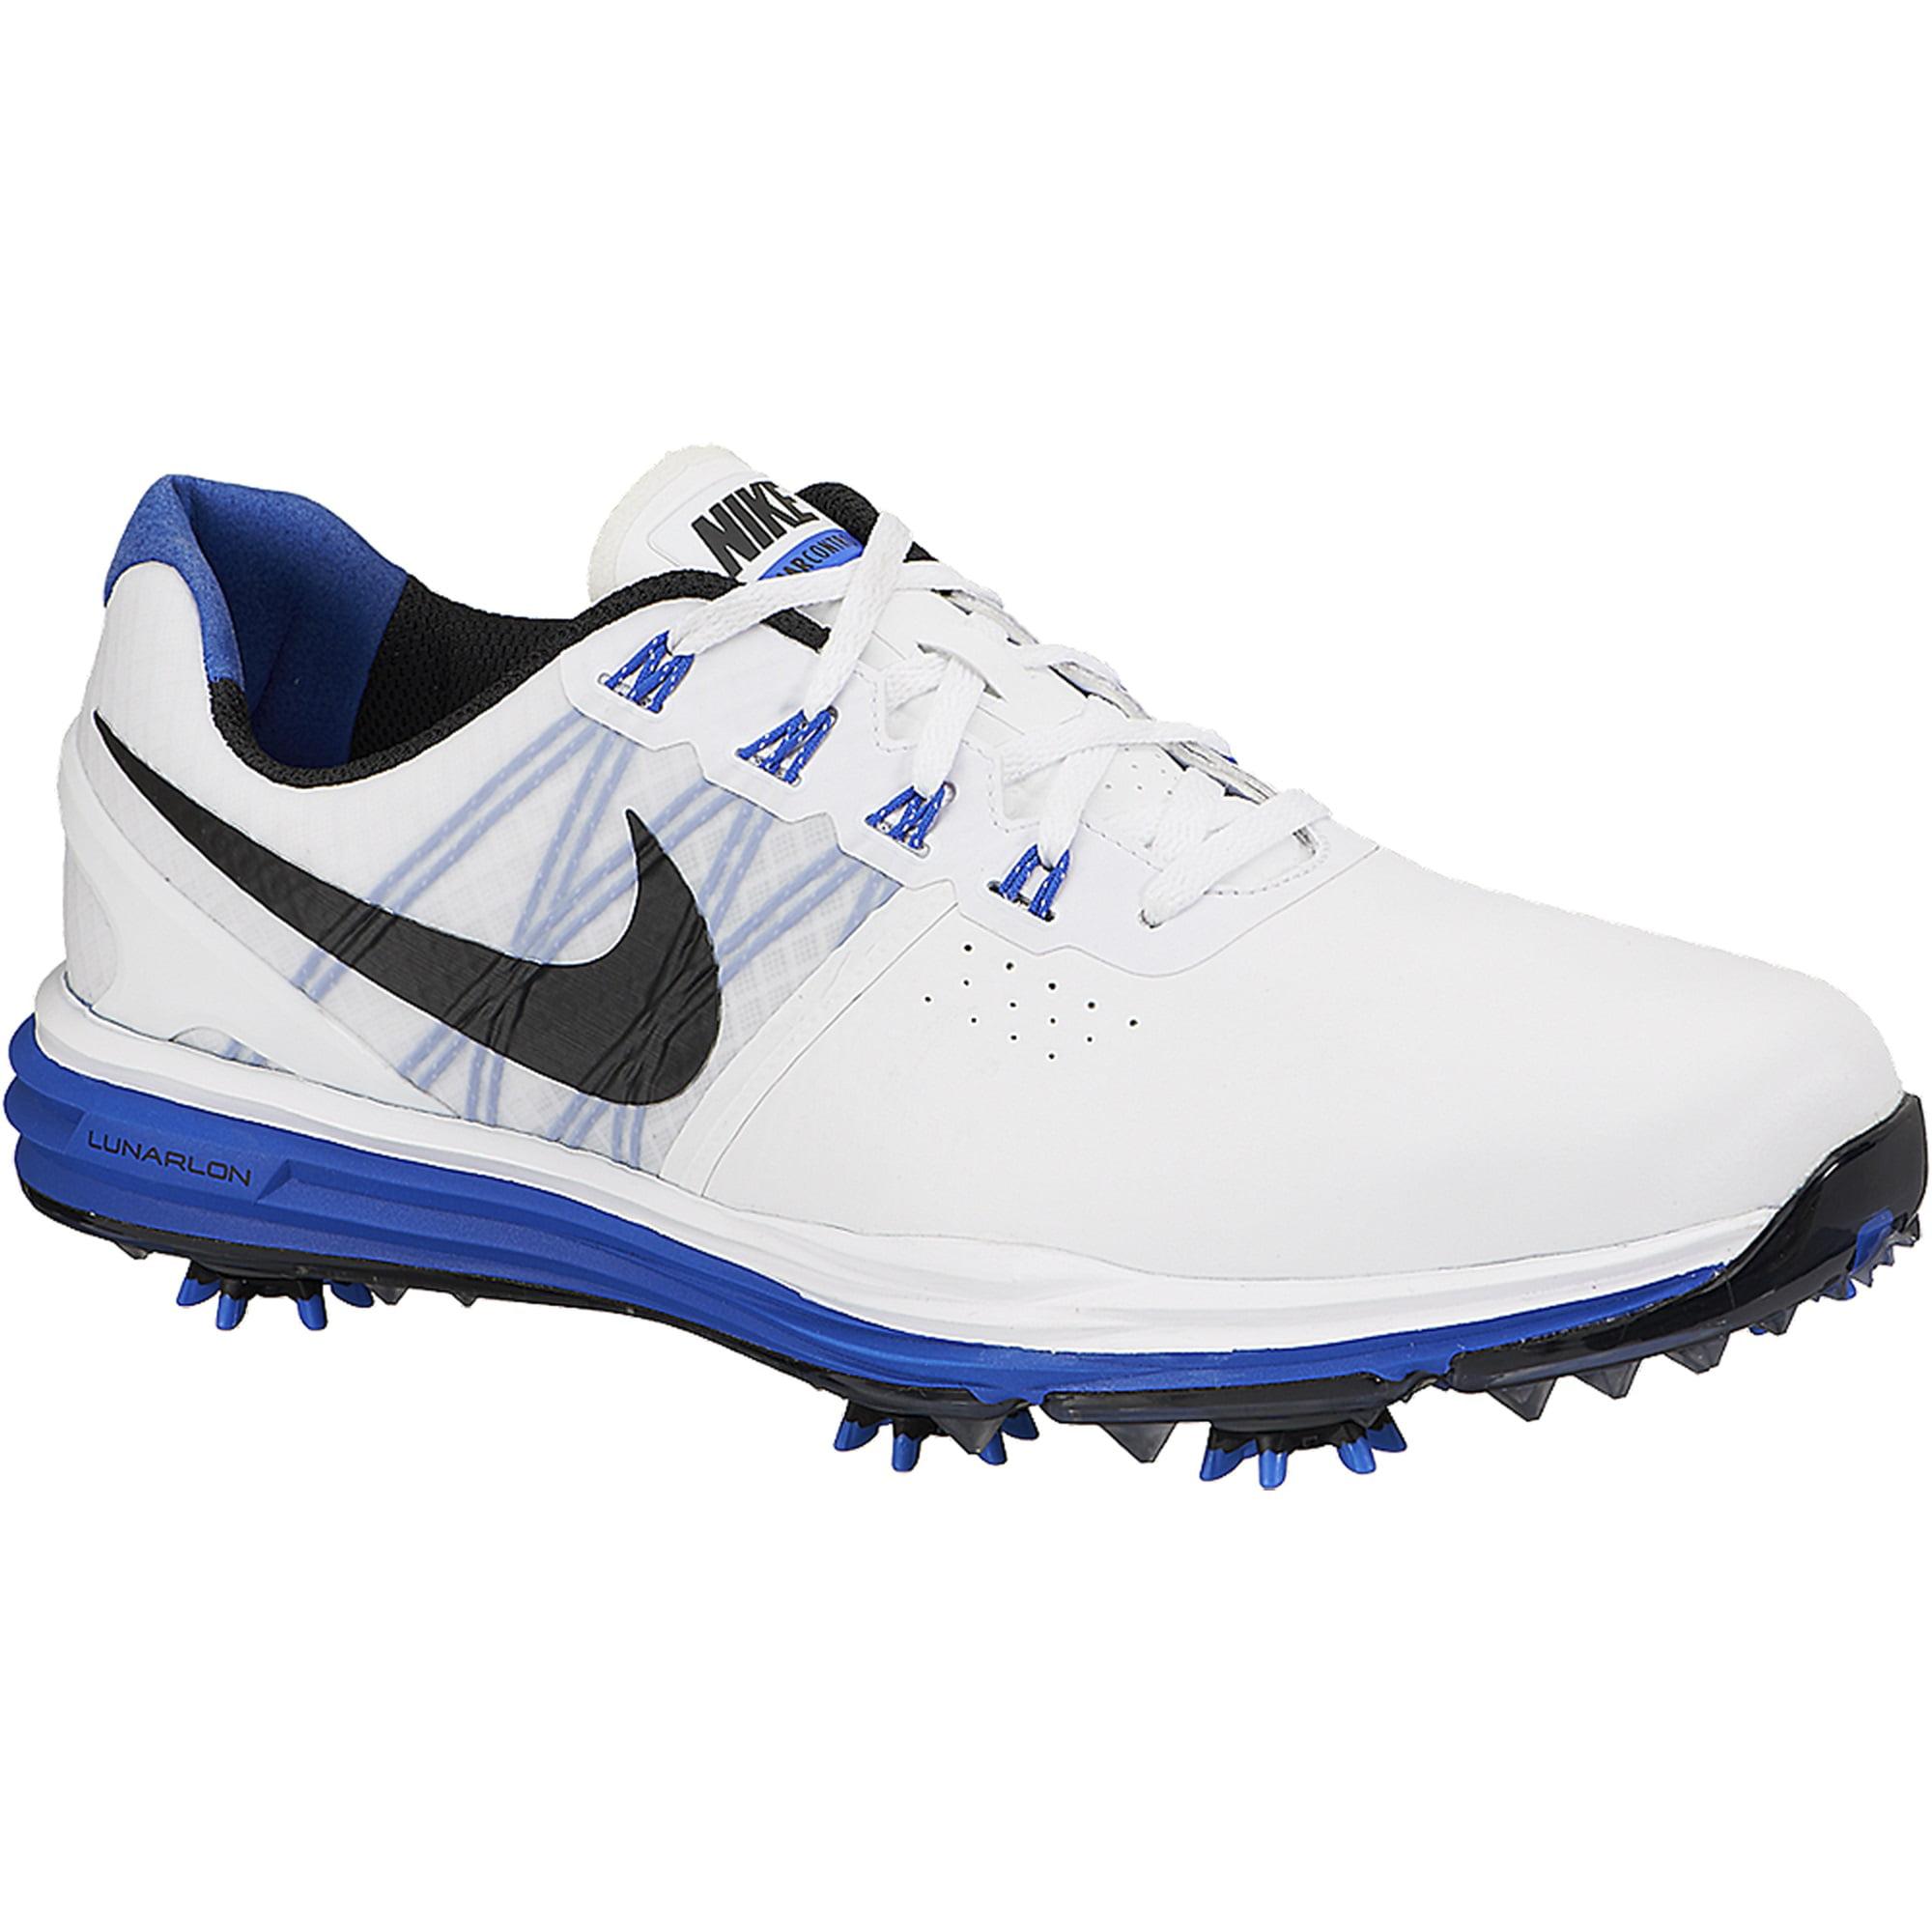 NEW Nike Lunar Control 3 Golf Shoes